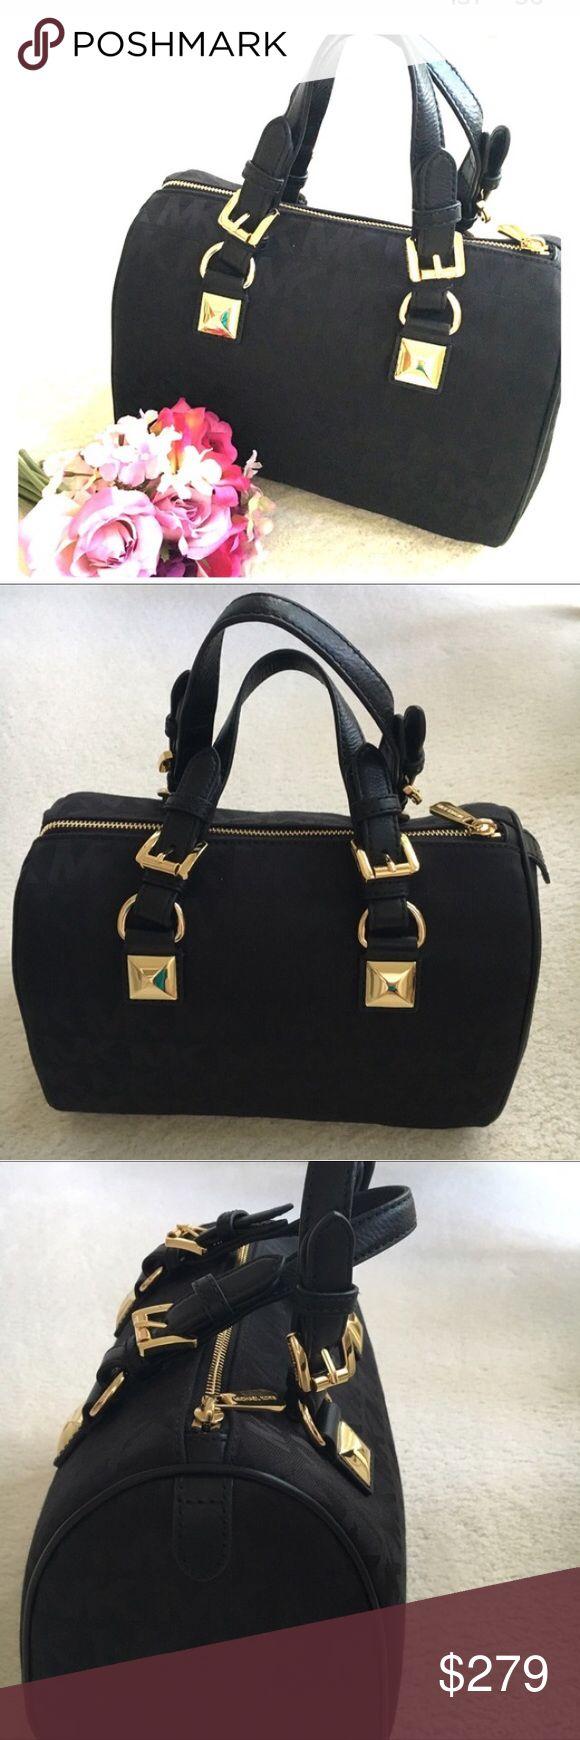 Michael Kors satchel Gorgeous Black Greyson Monogram medium canvas satchel with MK Logo and gold tone hardware by Michael Kors . Measures 9.5 x 14  New! Authentic 🚫trades Michael Kors Bags Satchels